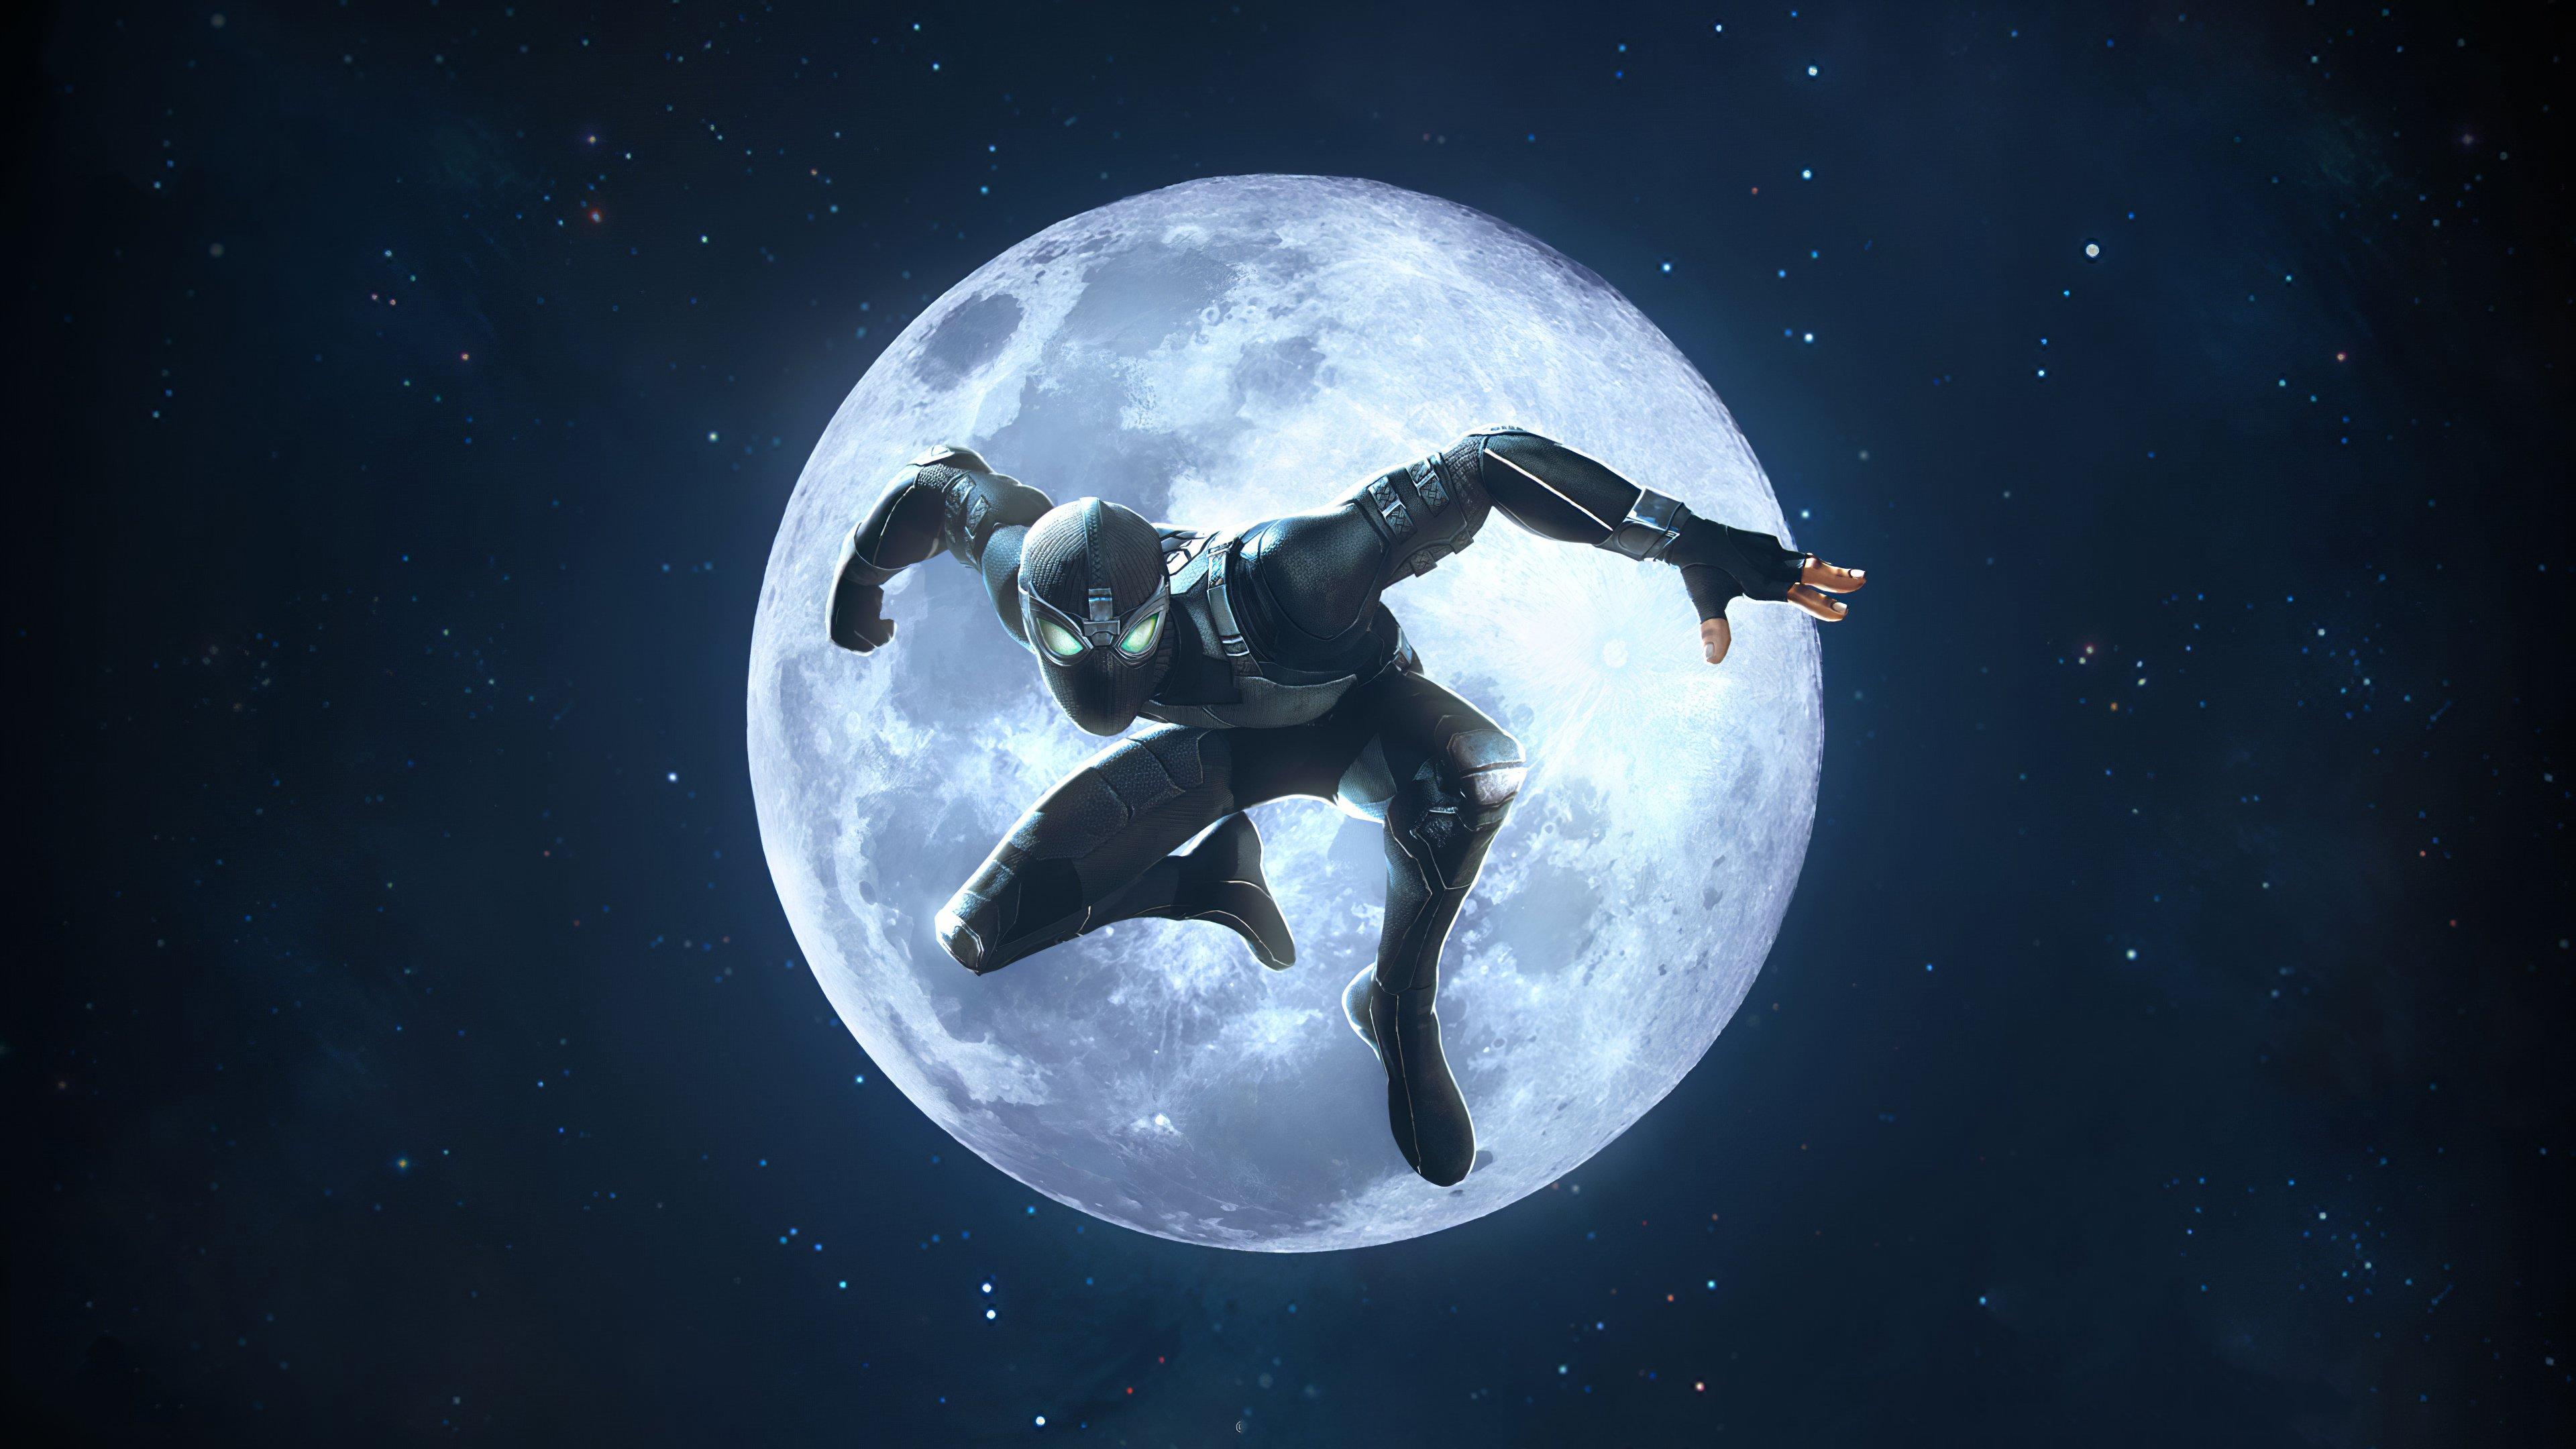 Fondos de pantalla El hombre araña traje negro en la luna